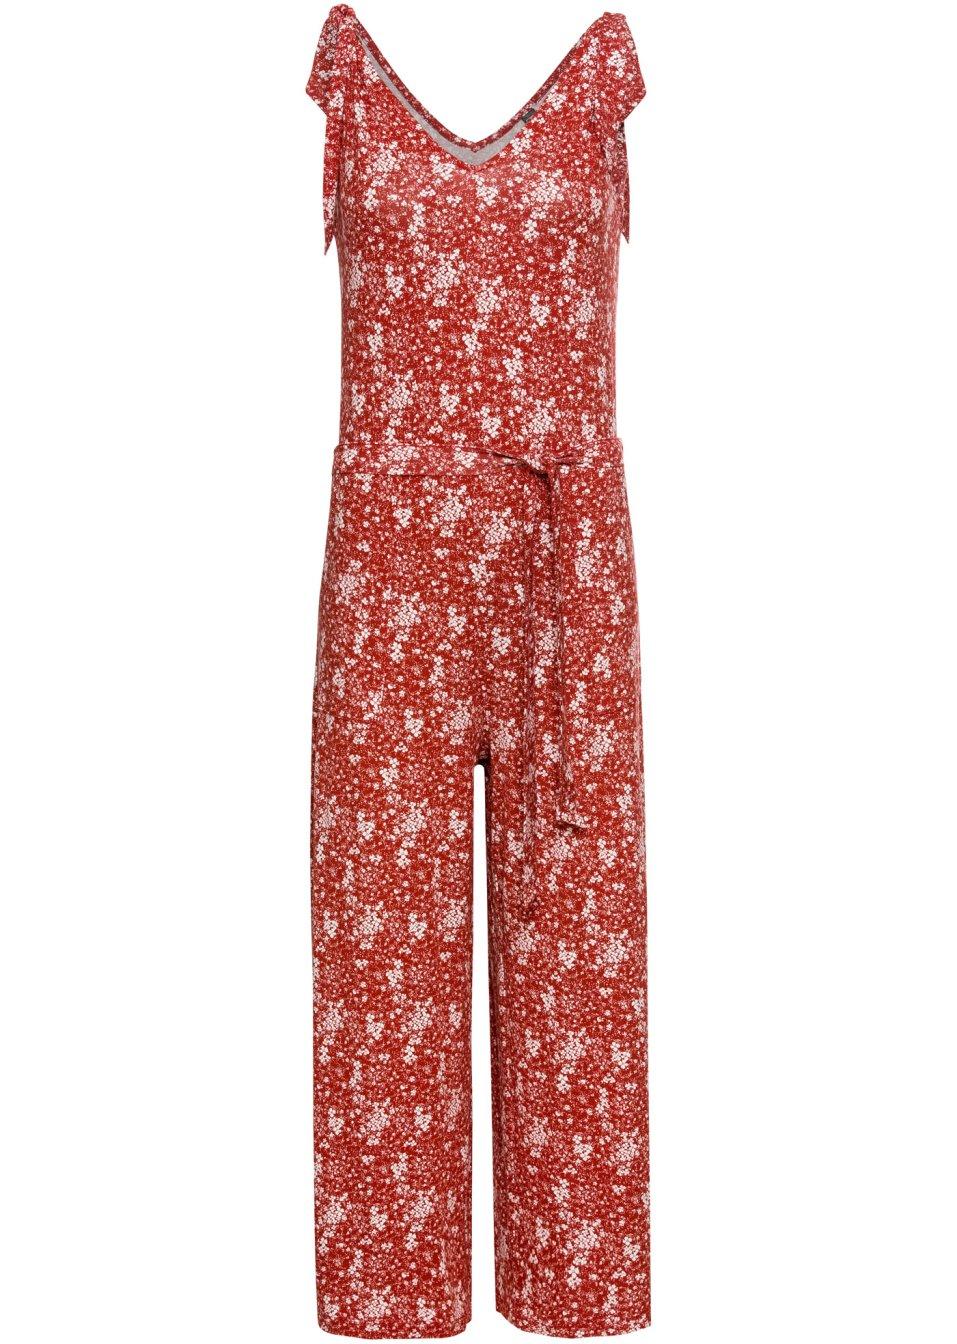 Jersey-Jumpsuit karminrot geblümt - Damen - RAINBOW - bonprix.de RNB2D 9M4T9